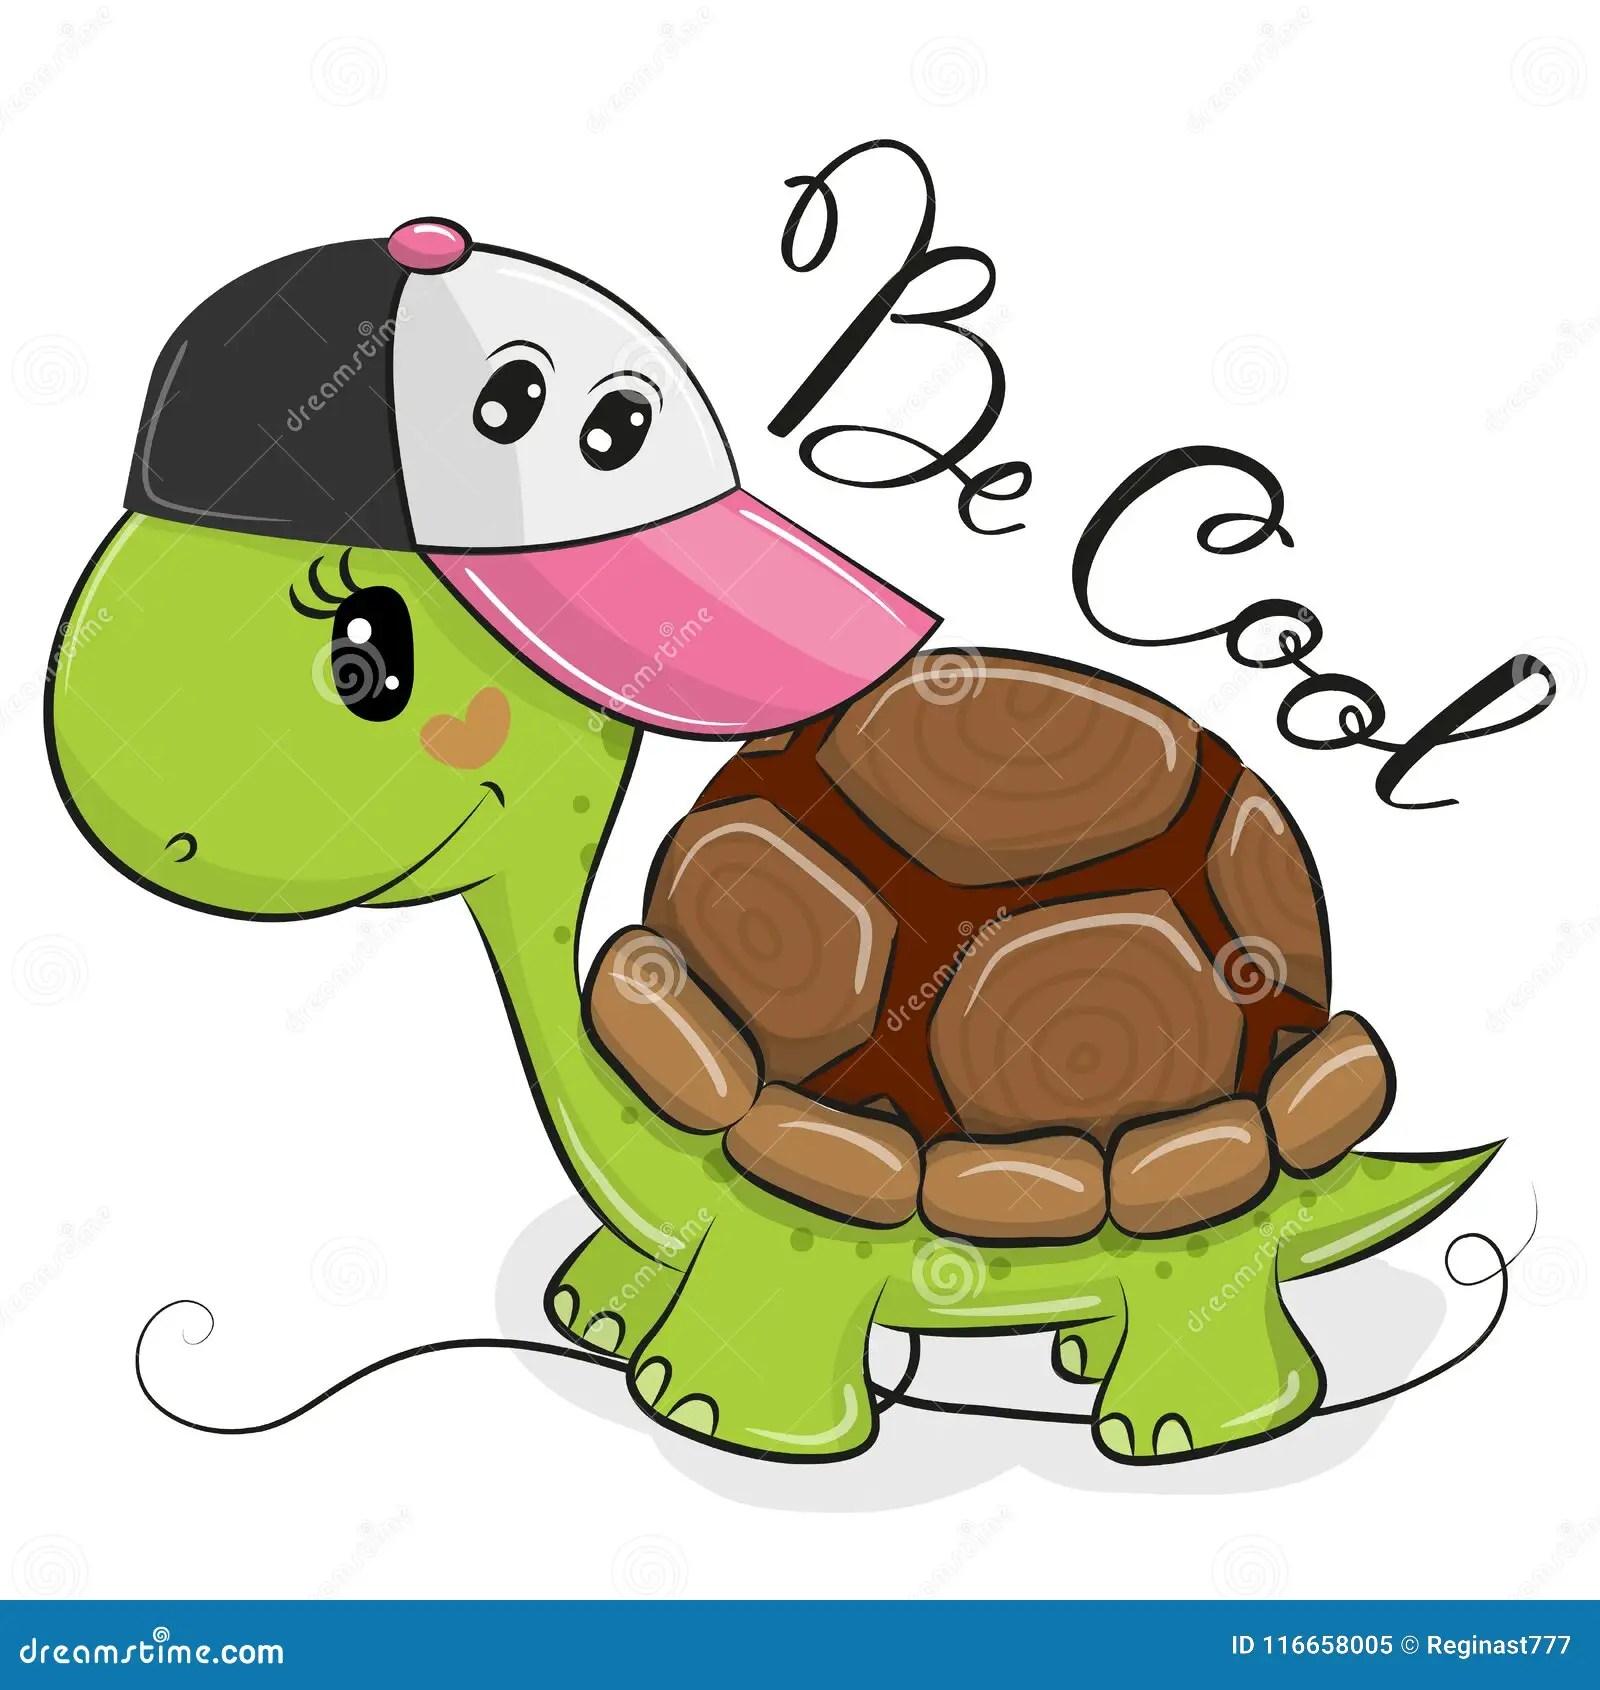 Cute Turtle Sketch Stock Illustrations 1 416 Cute Turtle Sketch Stock Illustrations Vectors Clipart Dreamstime